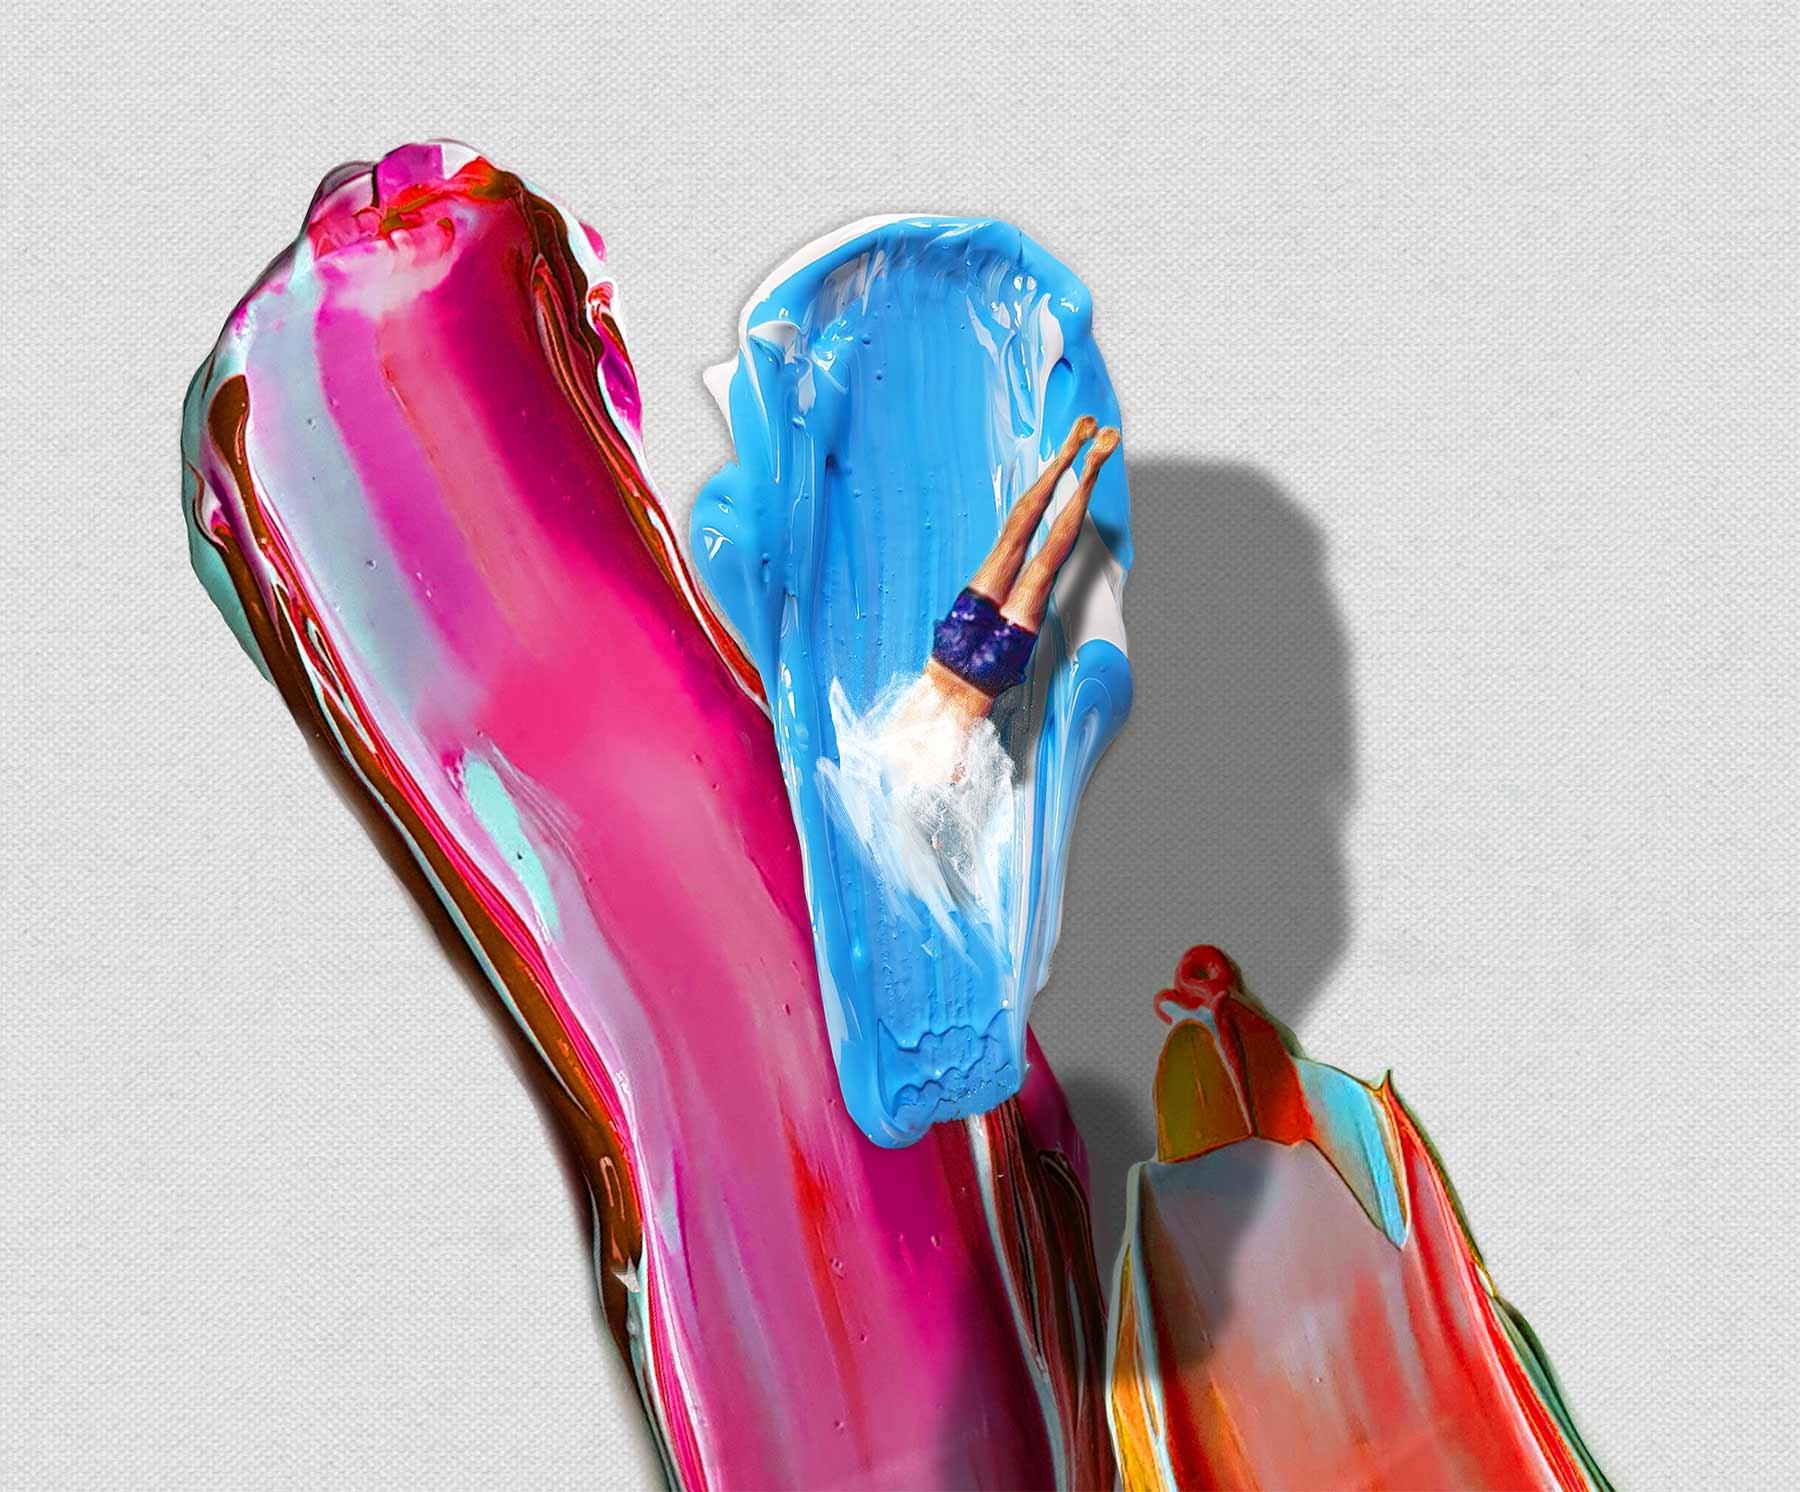 In Farbklecksen schwimmende Figuren von Golsa Golchini Golsa-Golchini_05